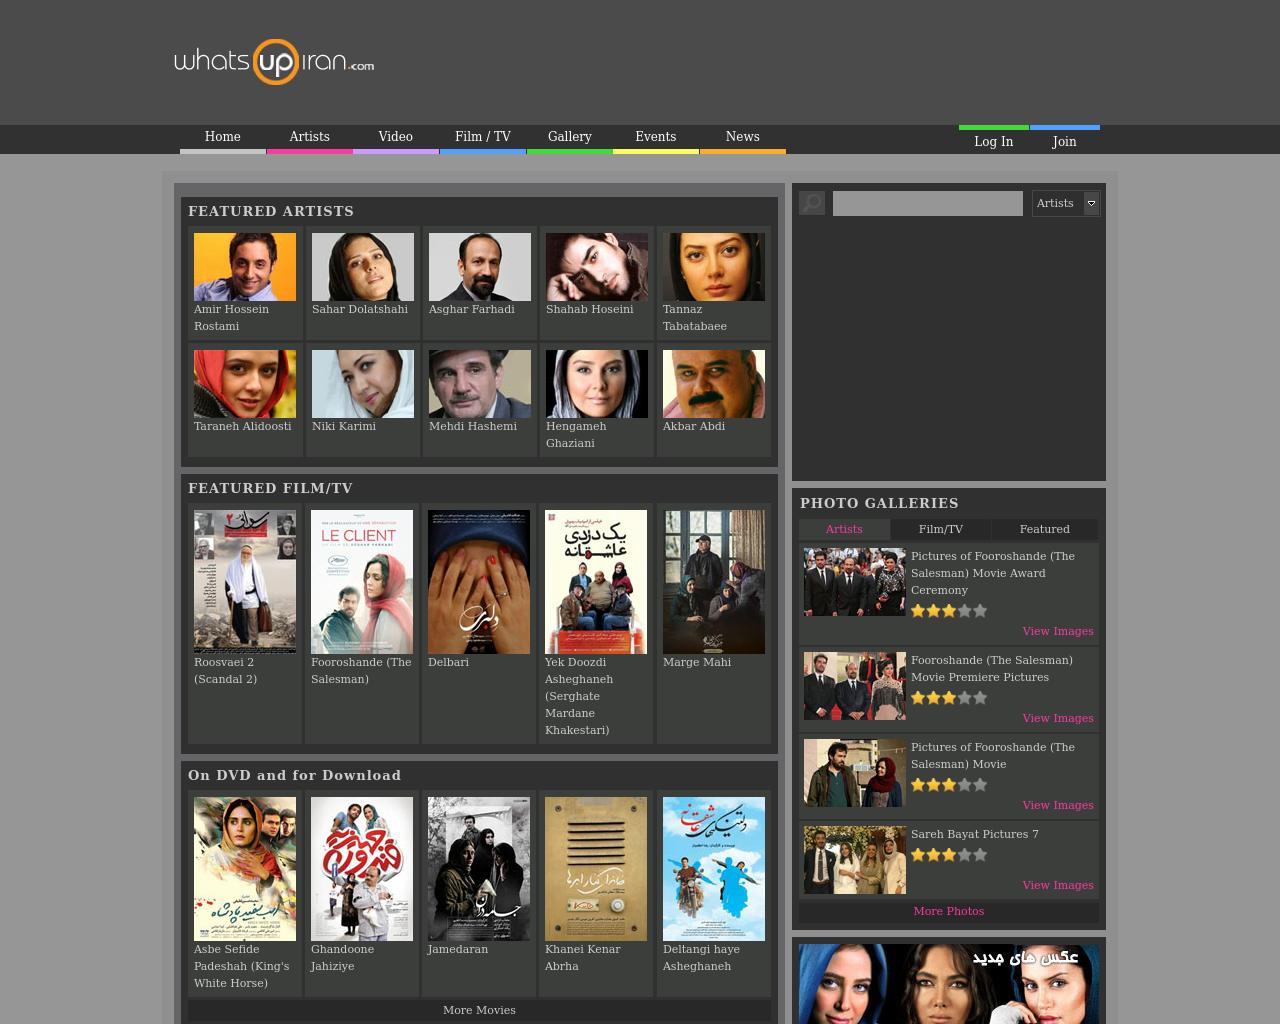 WhatsUpIran-Advertising-Reviews-Pricing